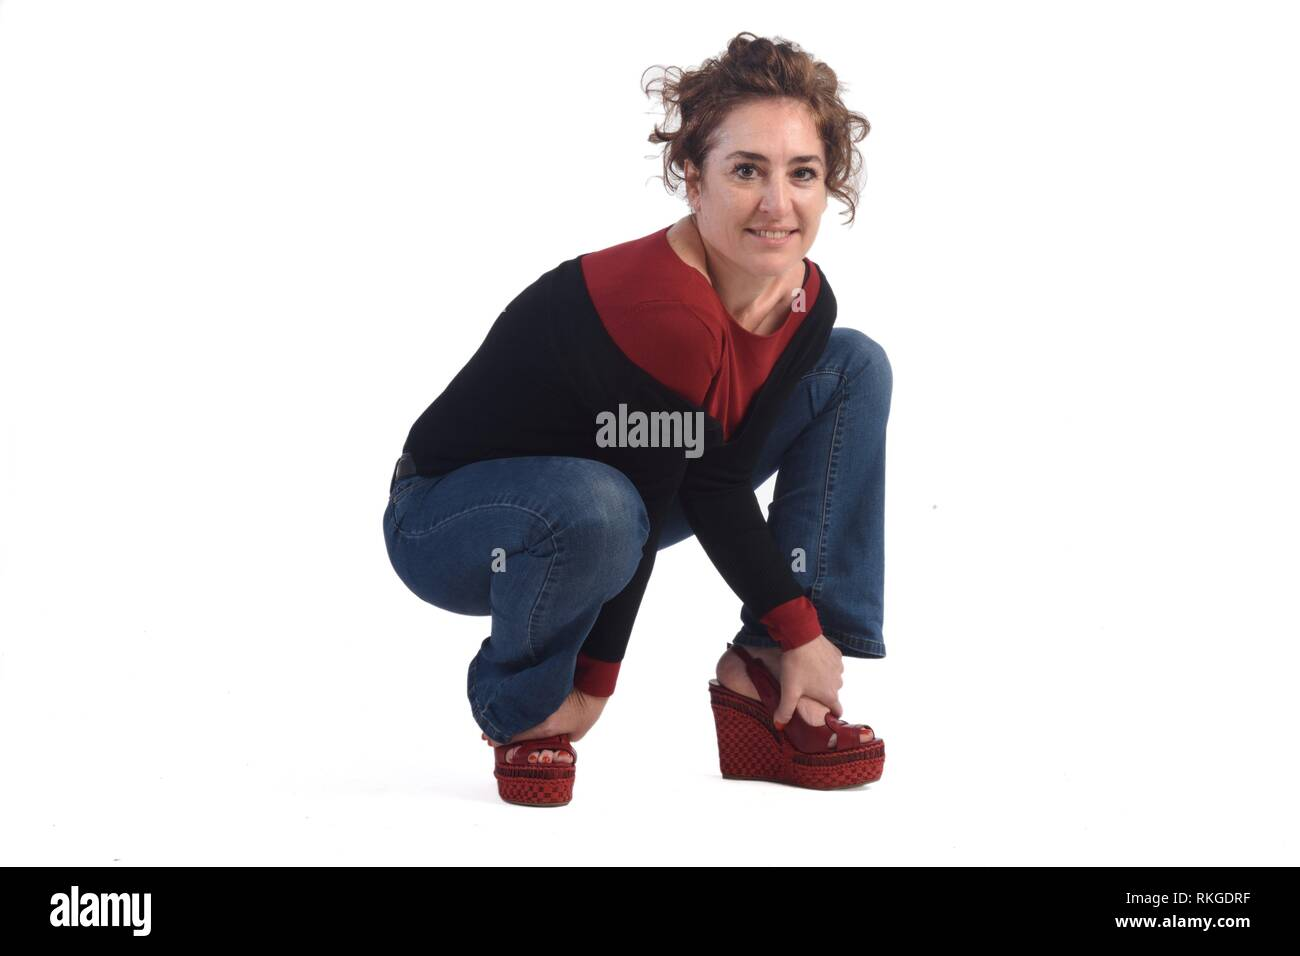 Woman crouching on a white background. Stock Photo